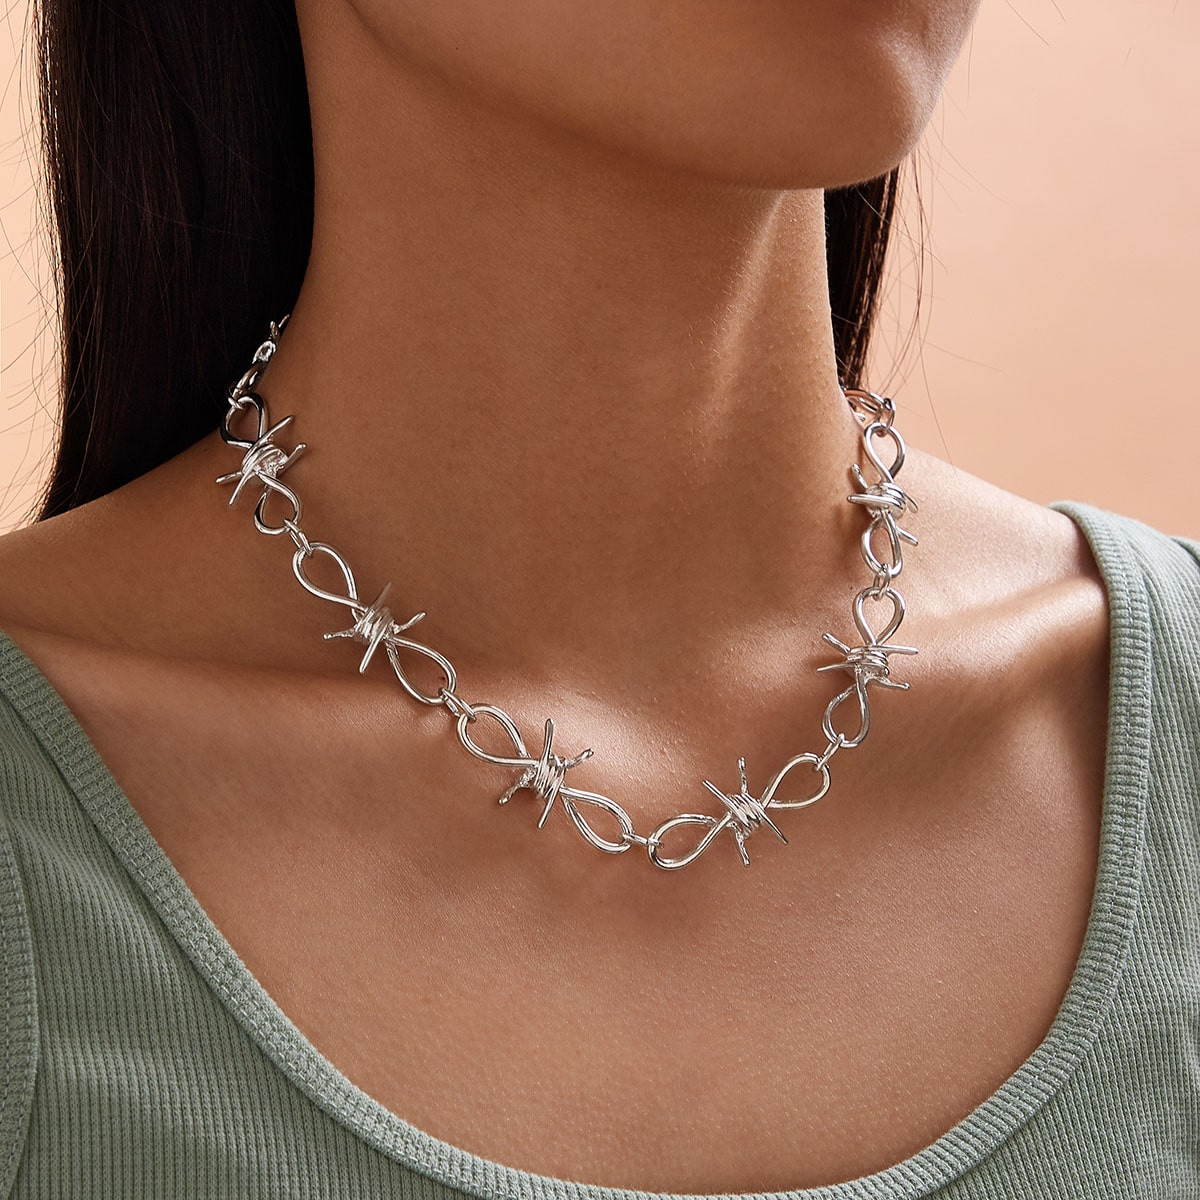 1pc Metallic Knot Decor Necklace